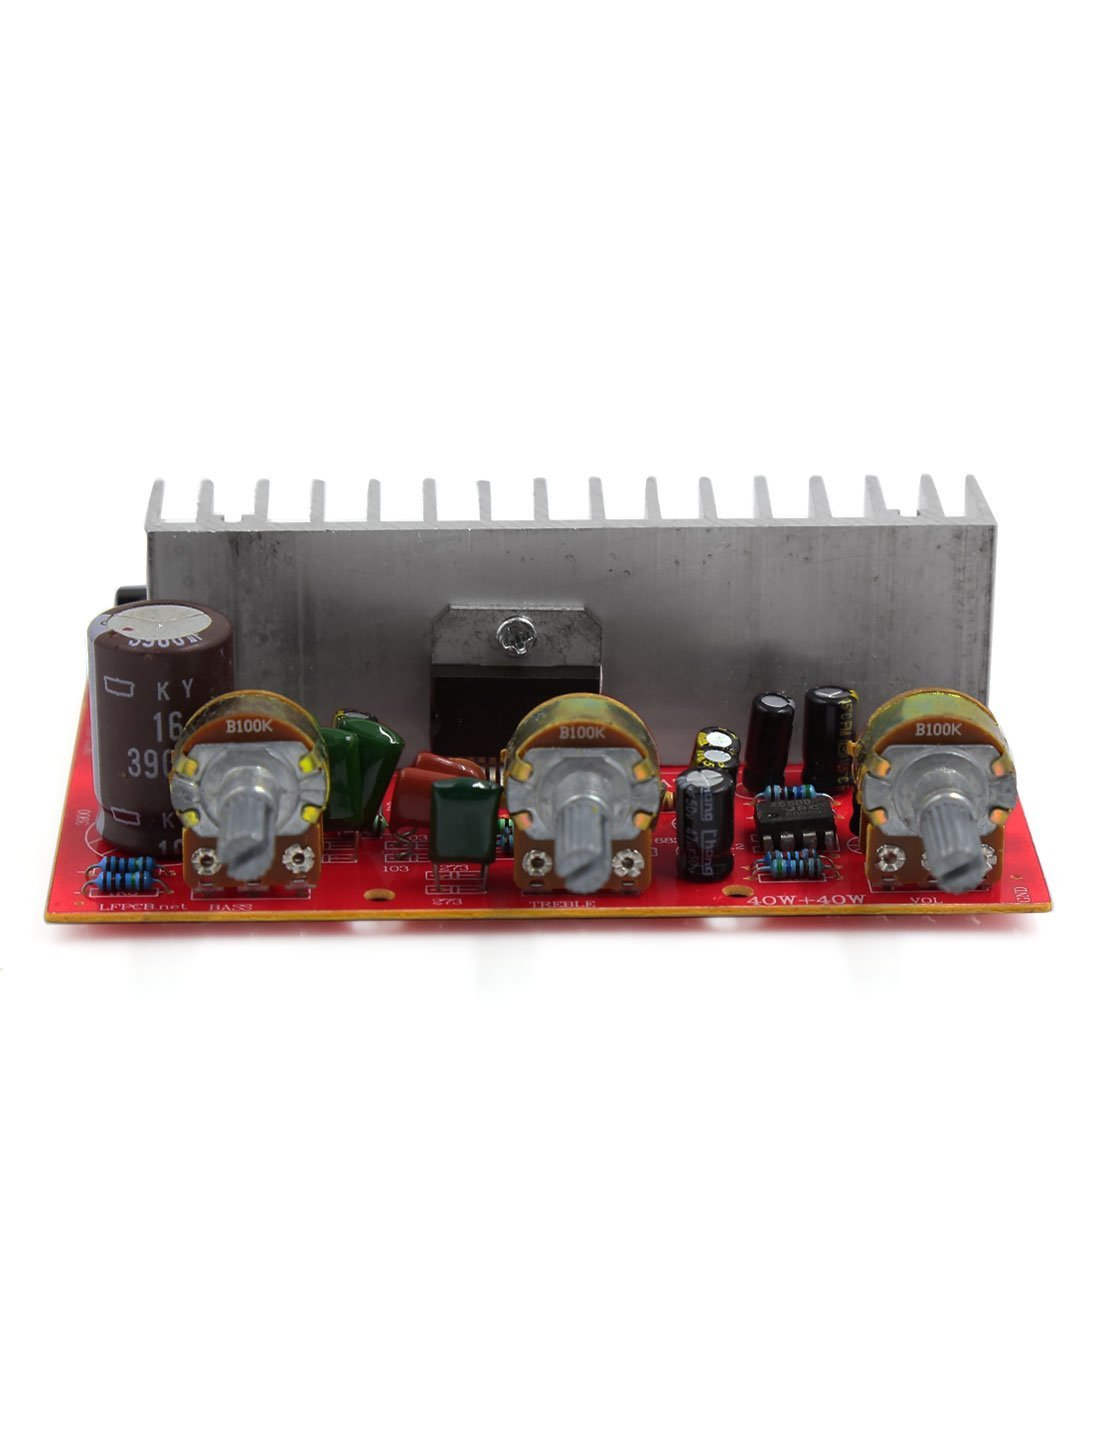 Amazon.com: 40W + 40W Áudio Hi-Fi Car Conselho Amplificador de Potência: Electronics